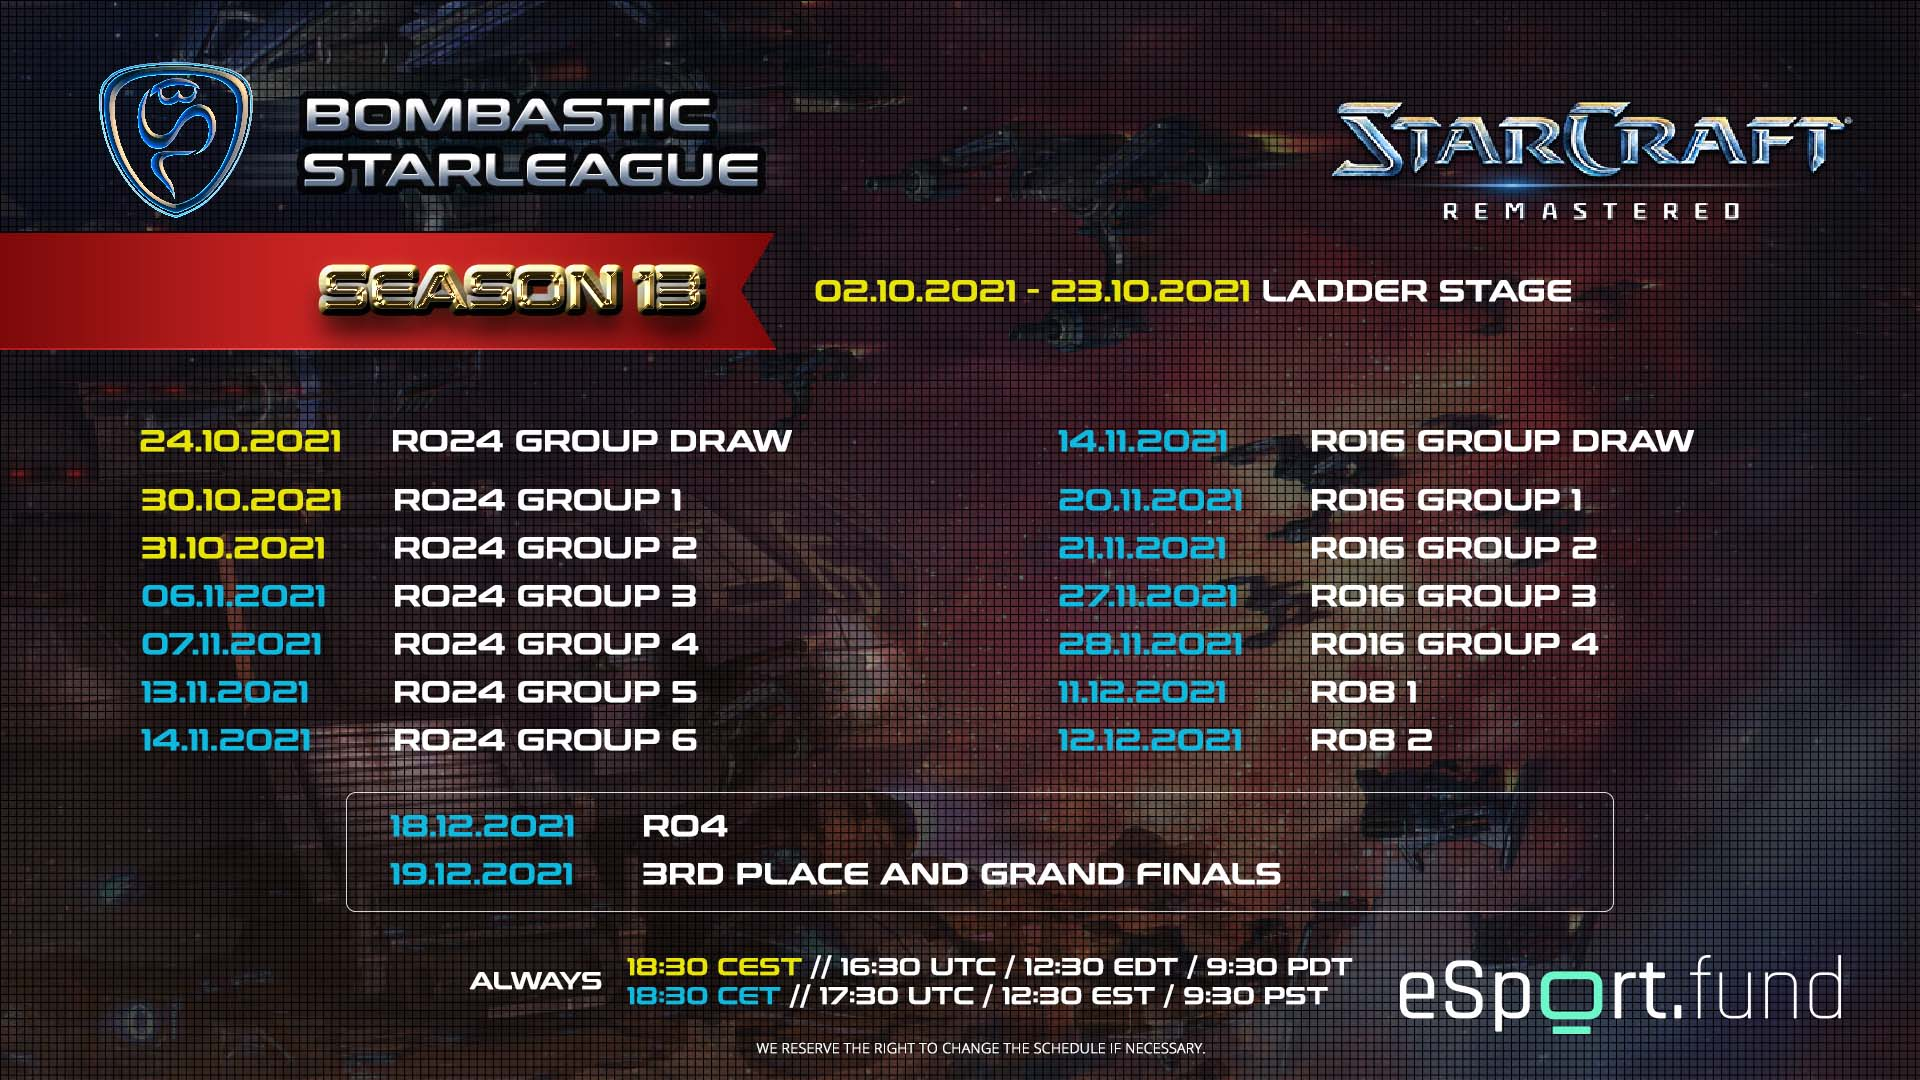 BSL Season 13 Schedule in Details